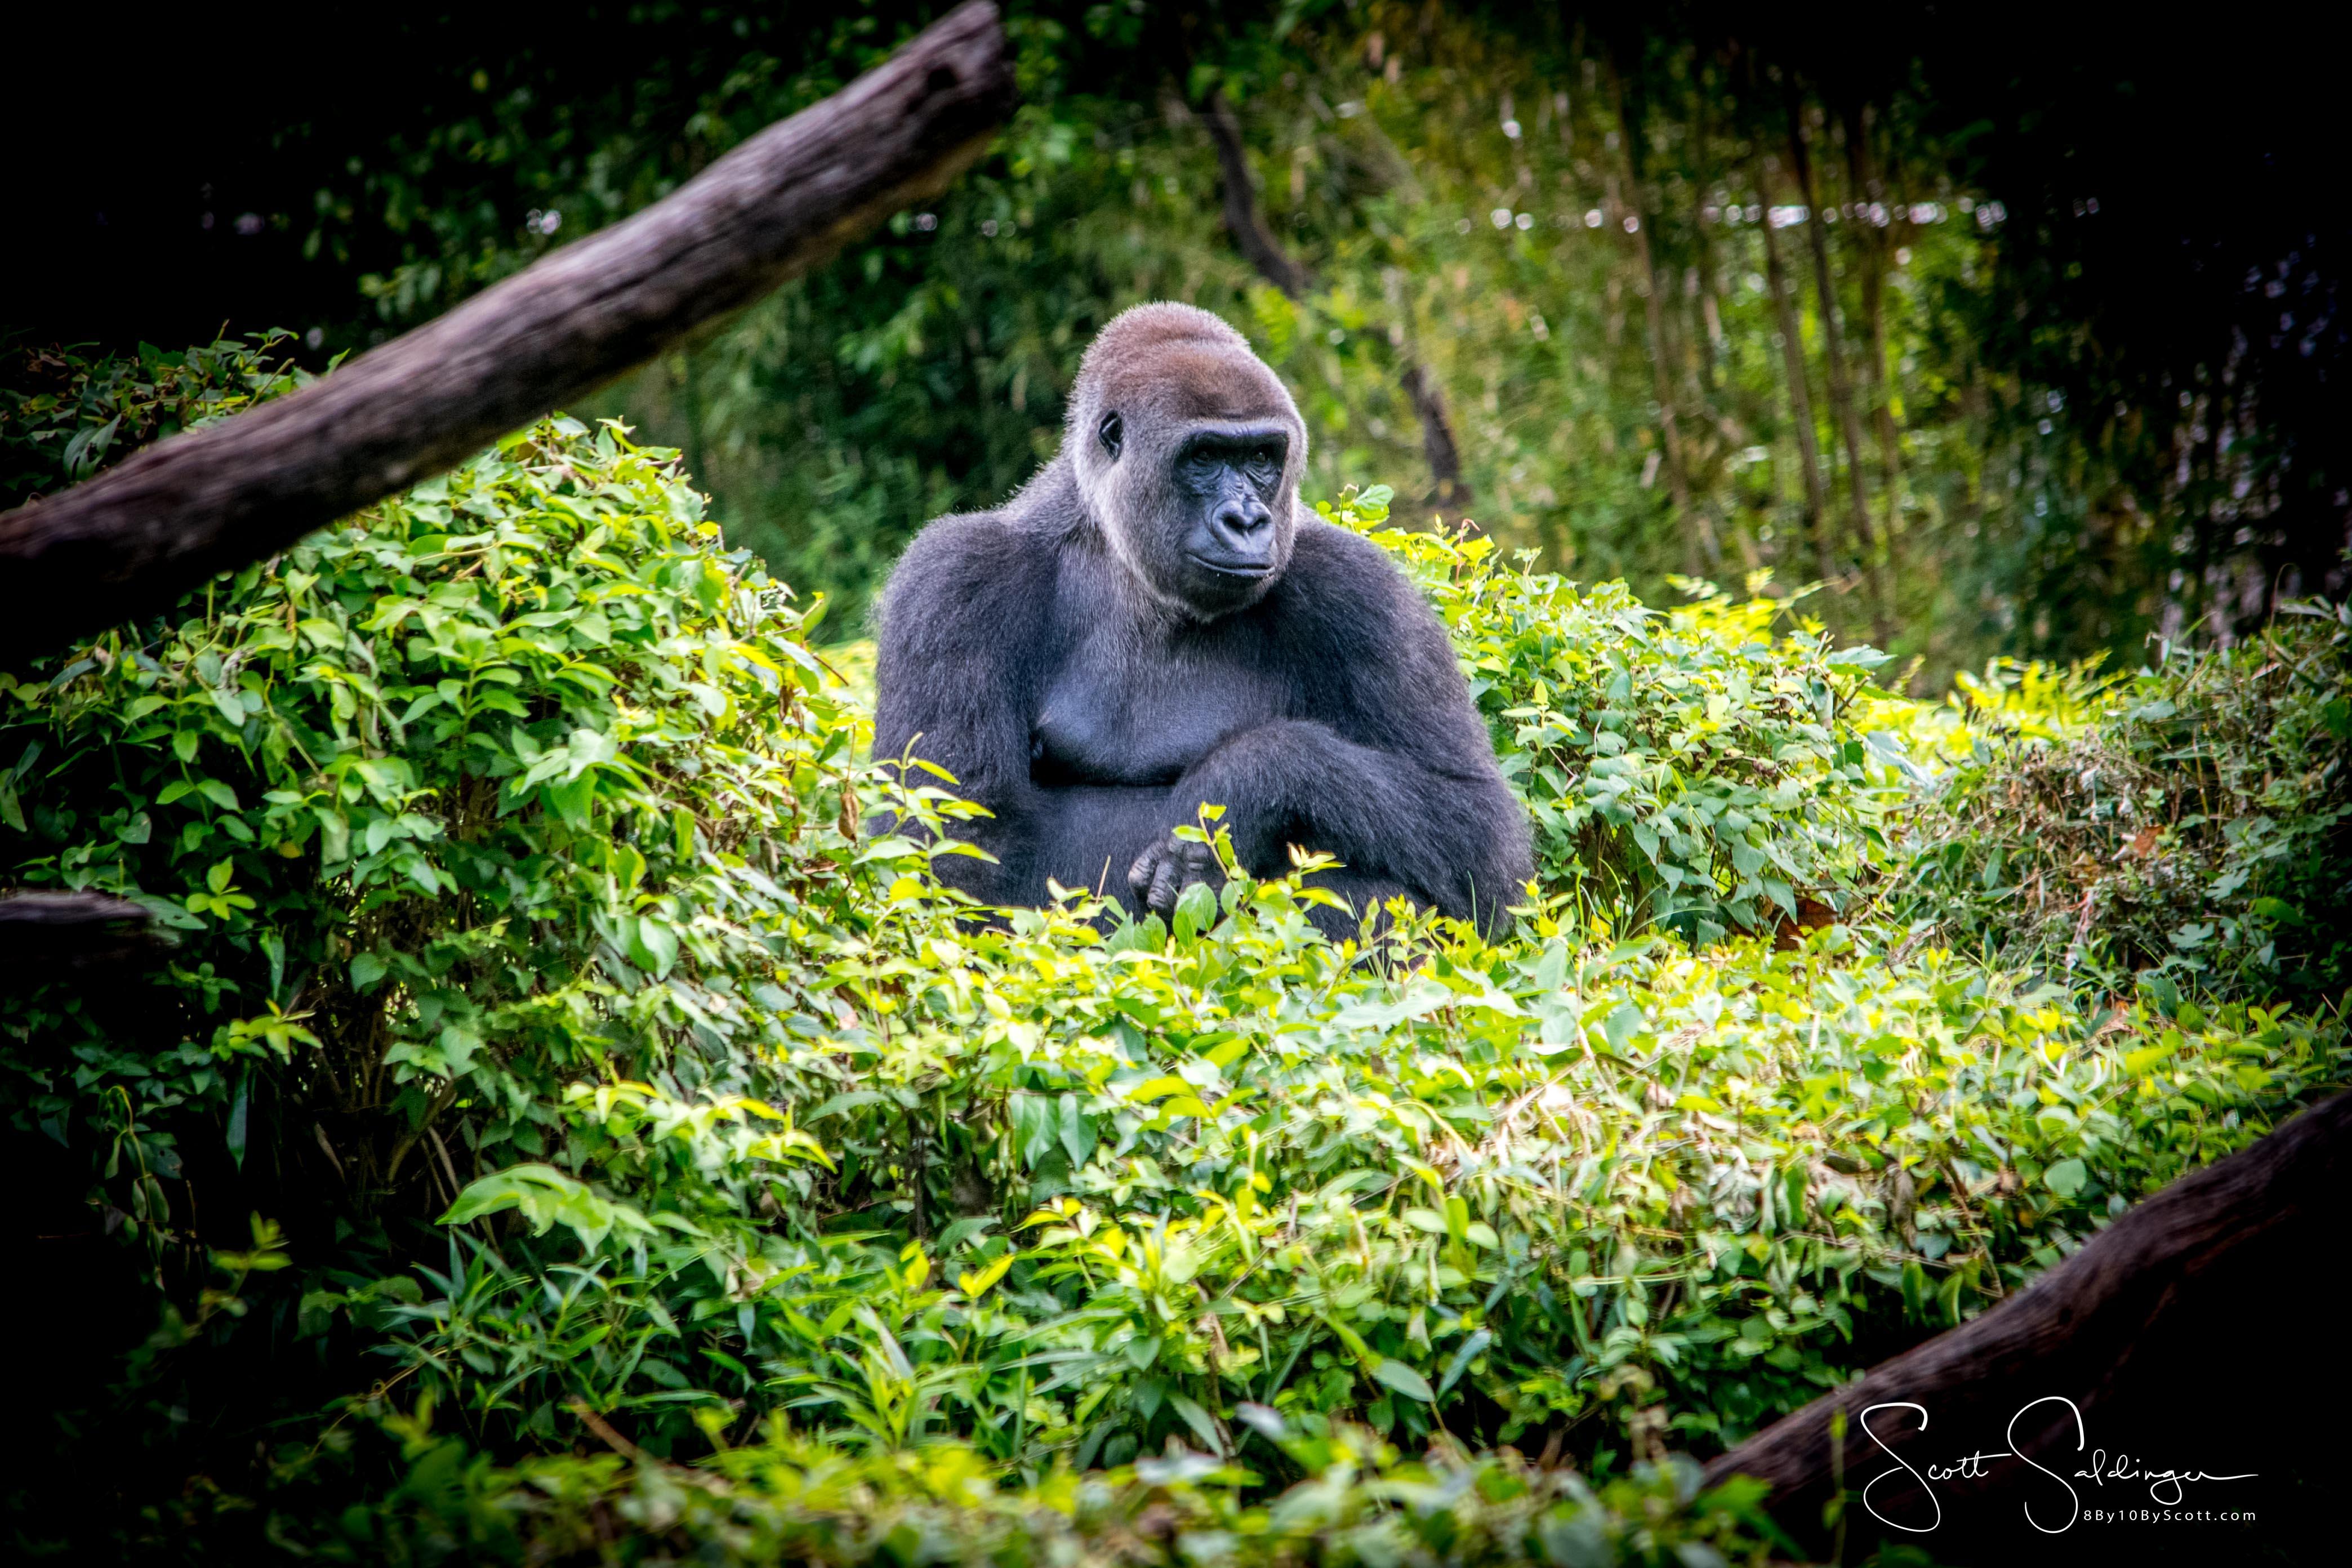 Apes-5473